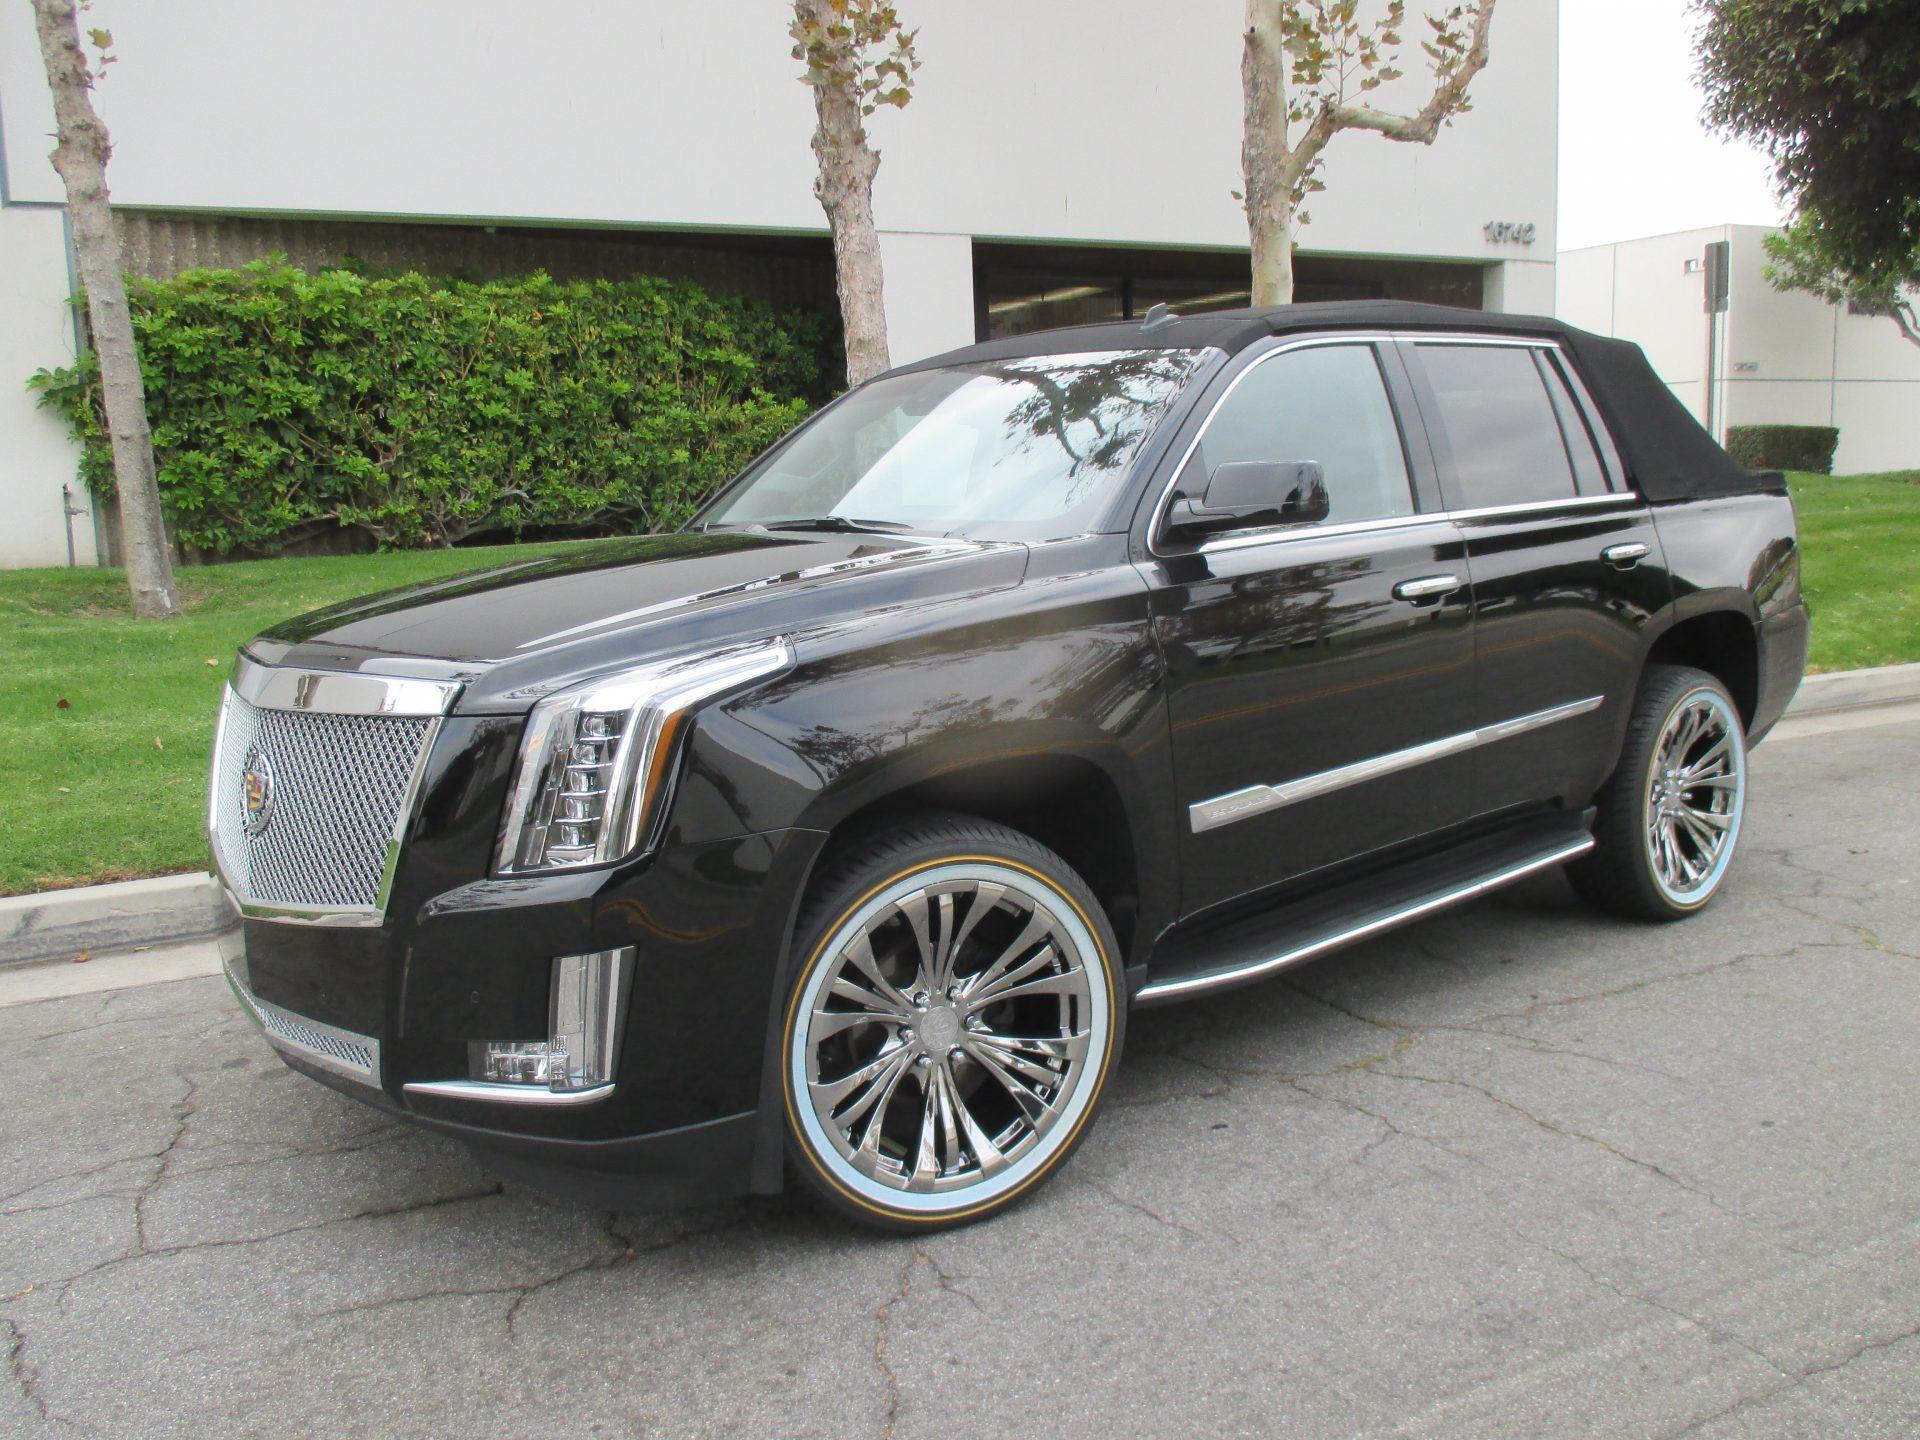 cadillac escalade convertible newport specialty cars. Black Bedroom Furniture Sets. Home Design Ideas